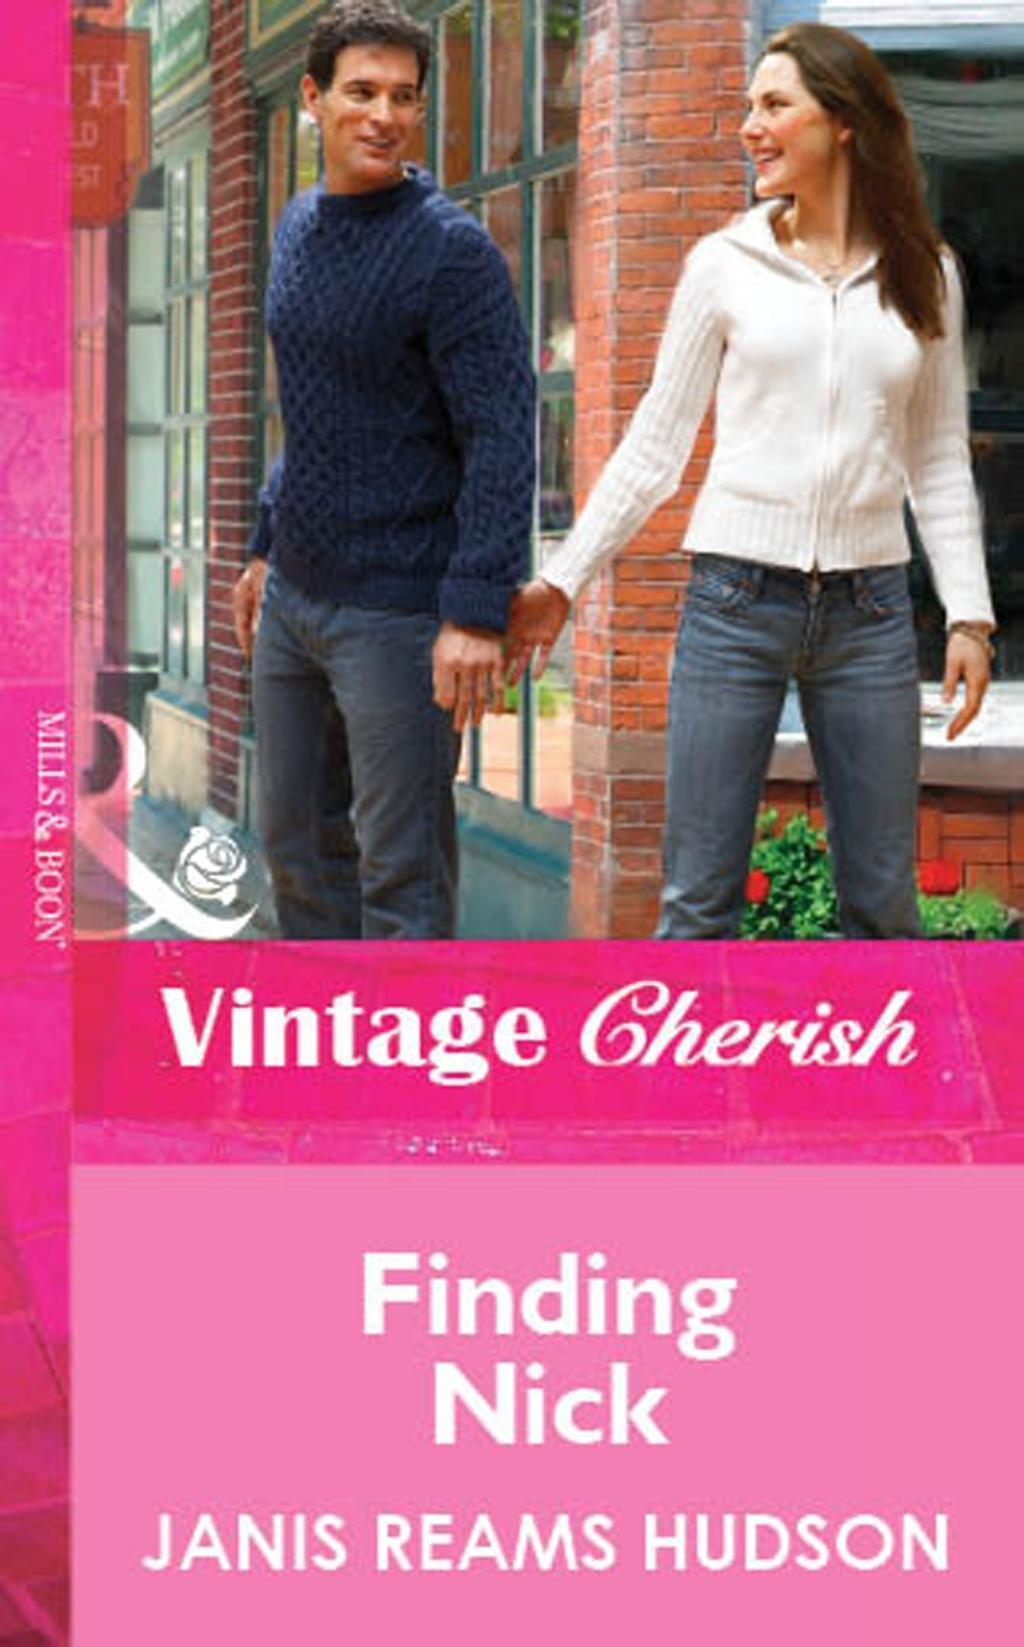 Finding Nick (Mills & Boon Vintage Cherish)